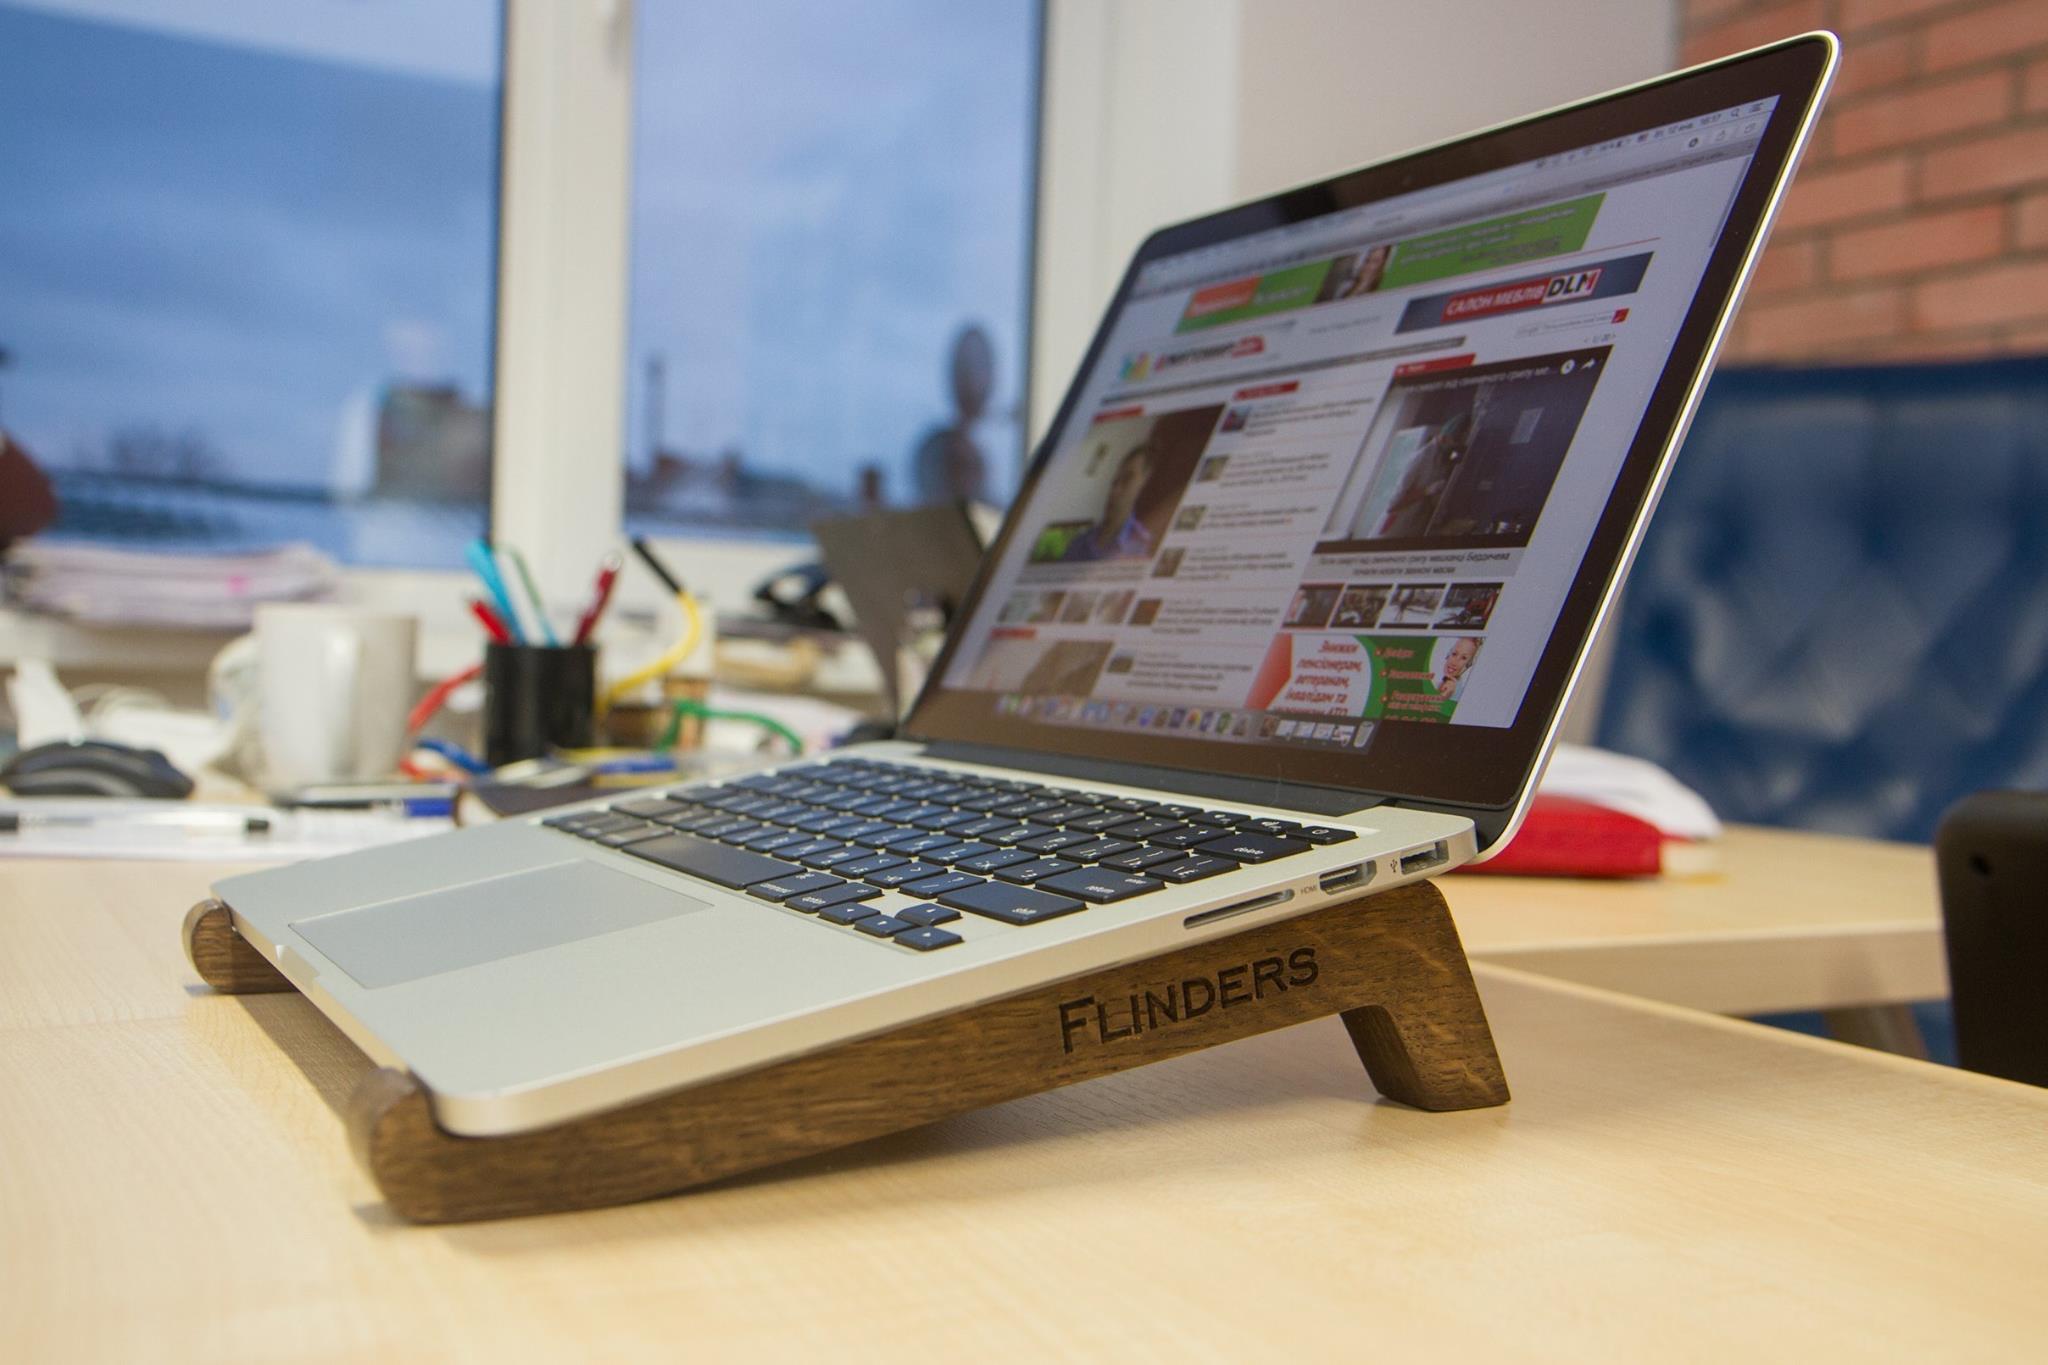 Come trasportare un MacBook in sicurezza? 3